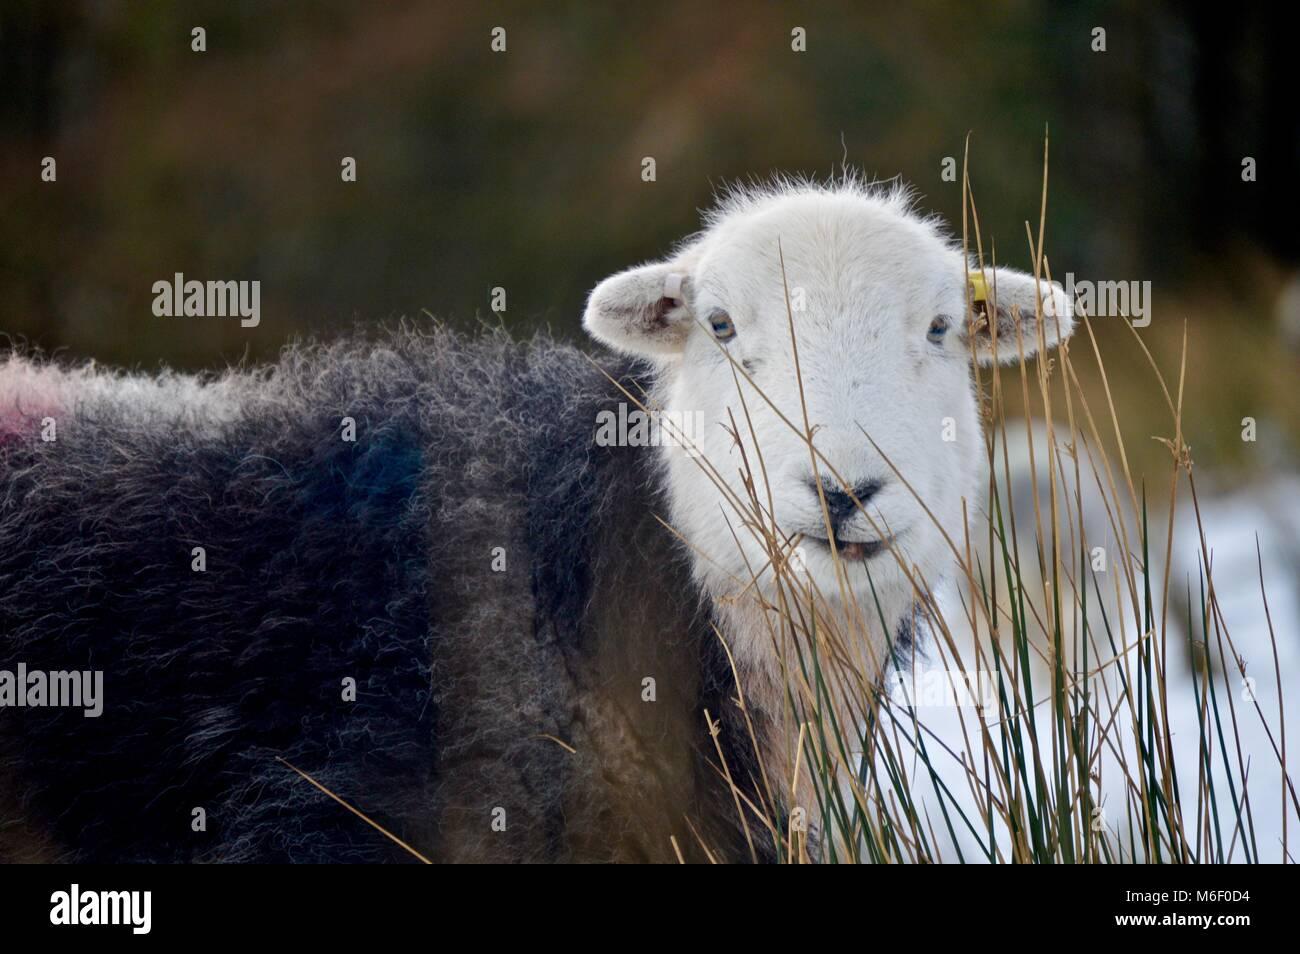 Herdwick Sherp In The Snow - Stock Image